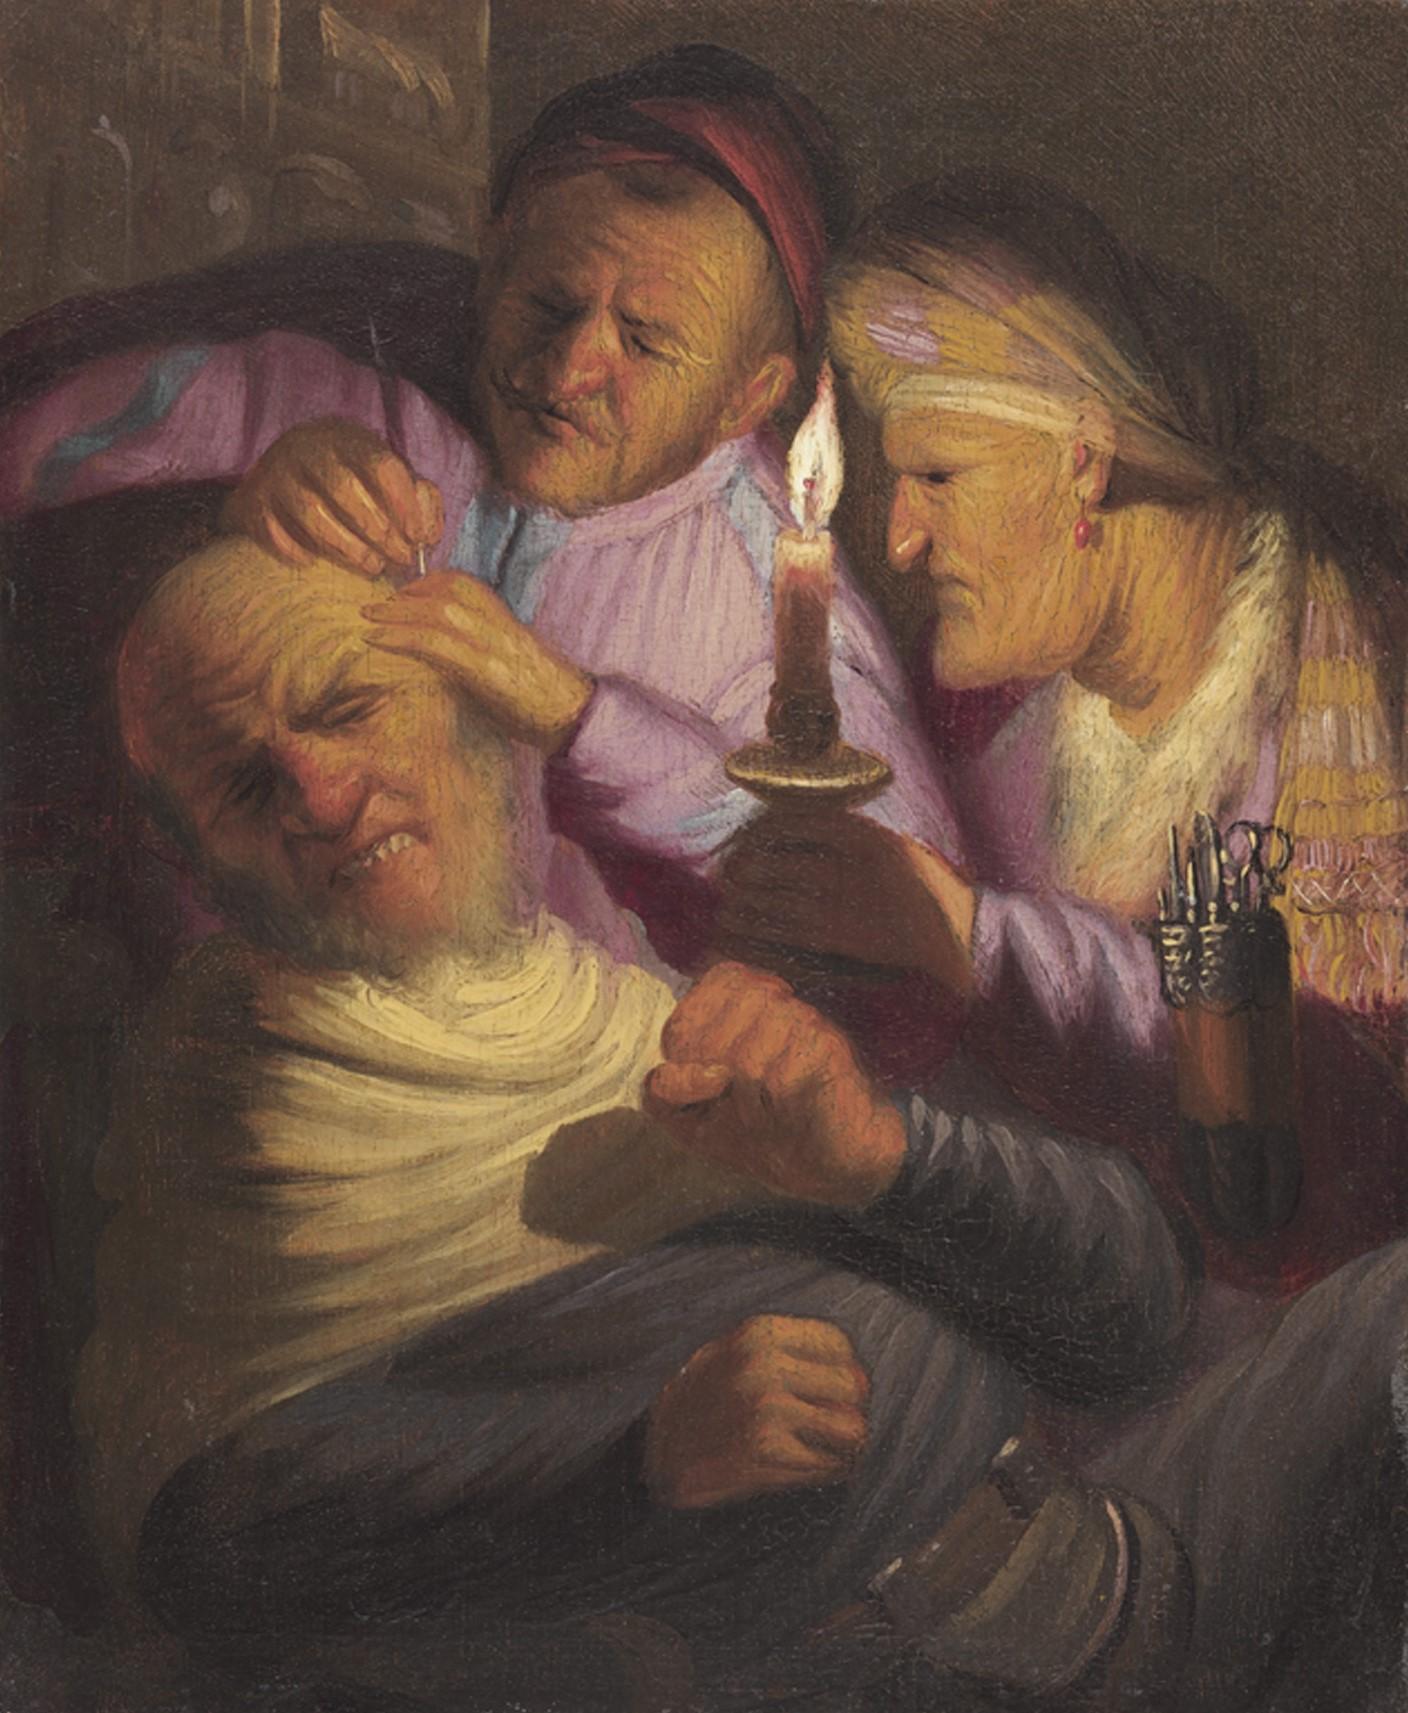 Keisnijding-Rembrandt-Leiden-Gallery-New-York.jpg